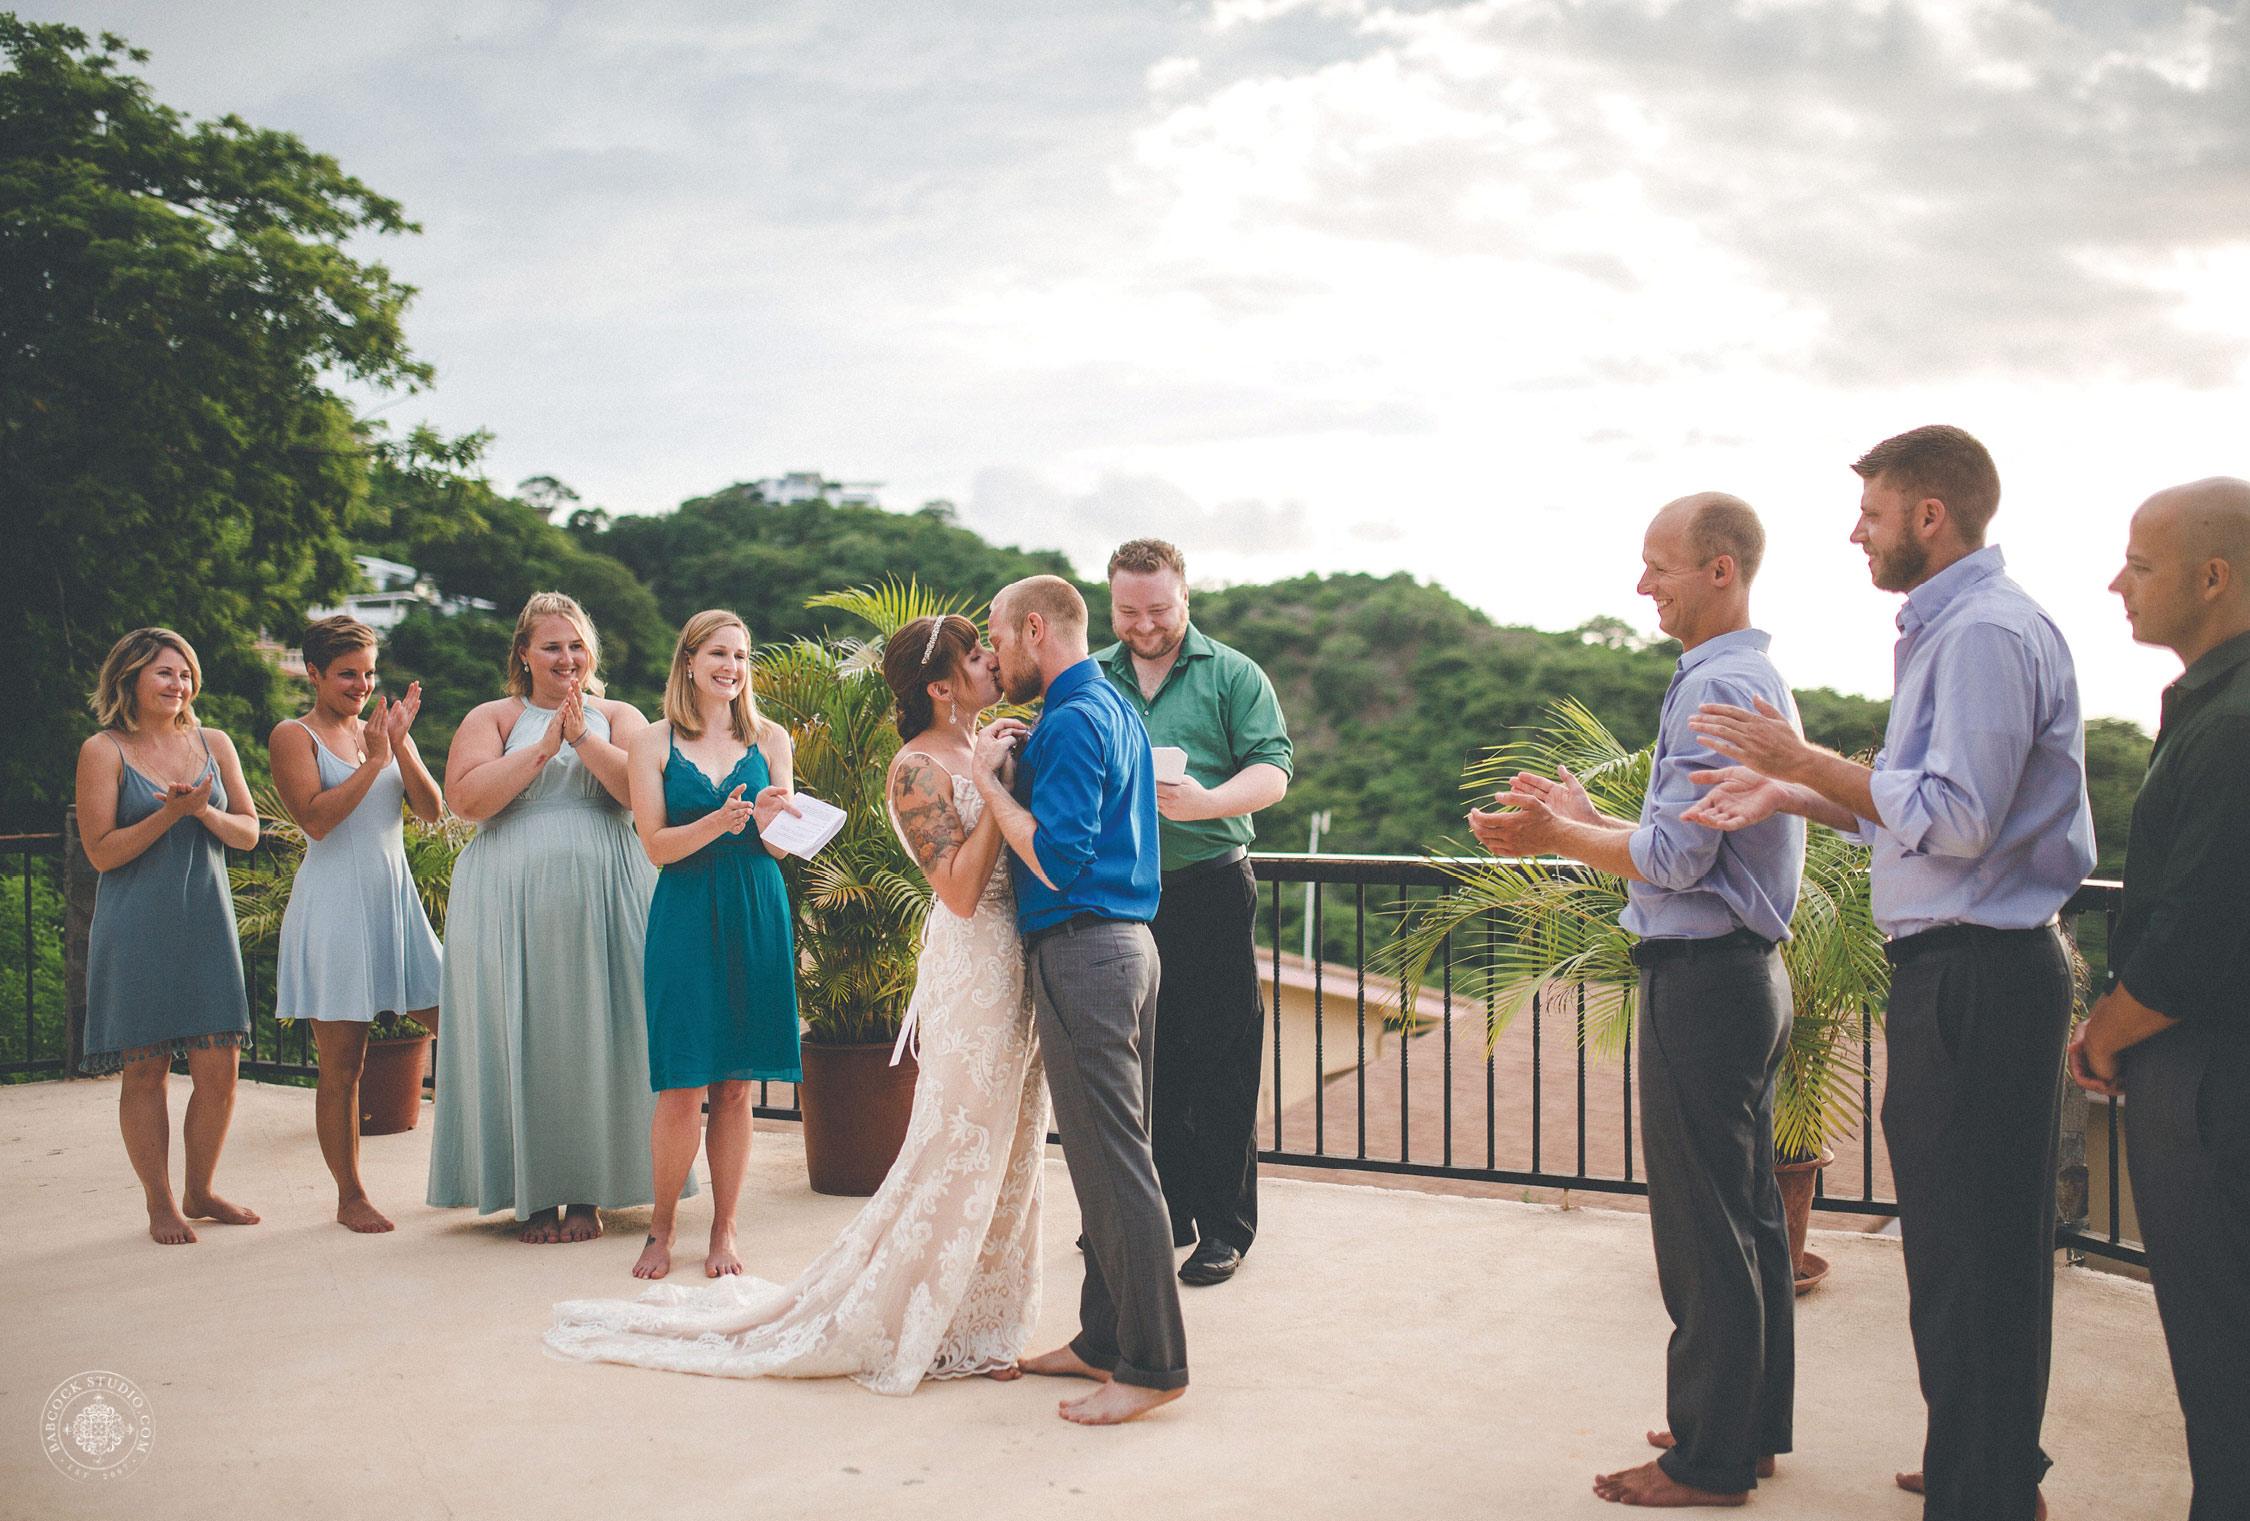 2cat-brandon-costa-rica-destination-wedding-photographer-dayton-ohio-22.jpg